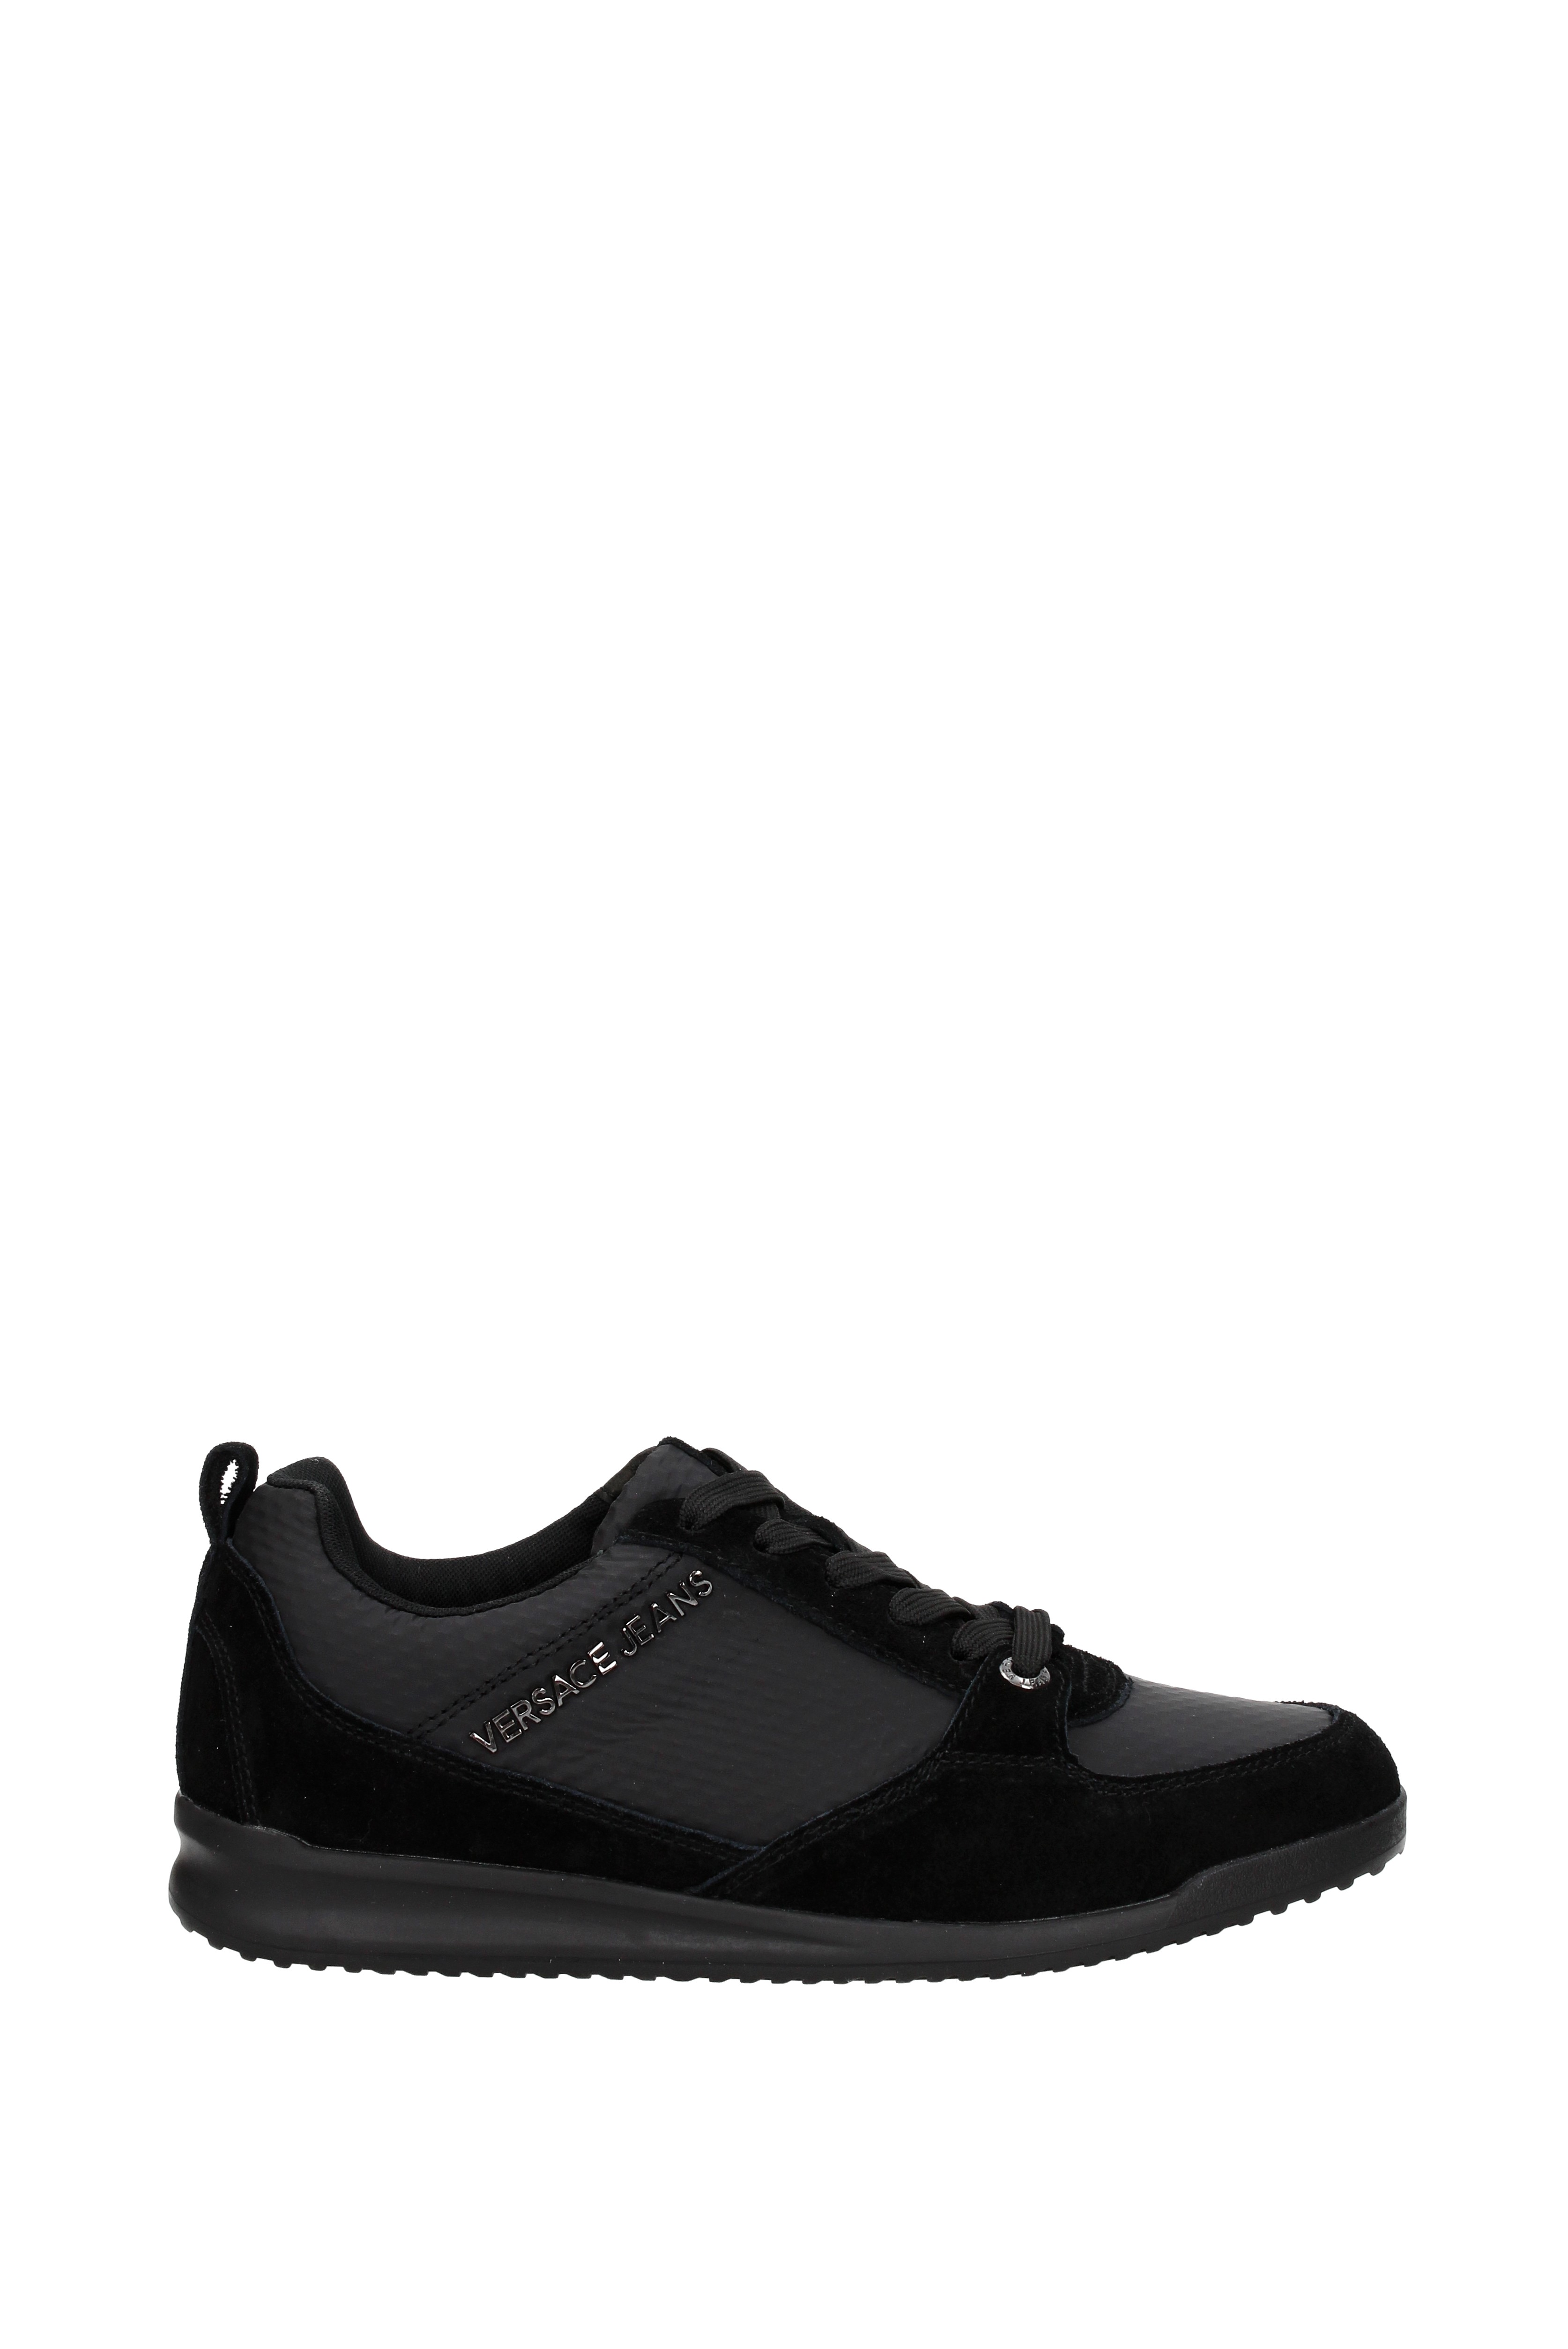 Sneakers Versace Jeans Nylon Herren - Nylon Jeans (E0YSBSC370851) f80142